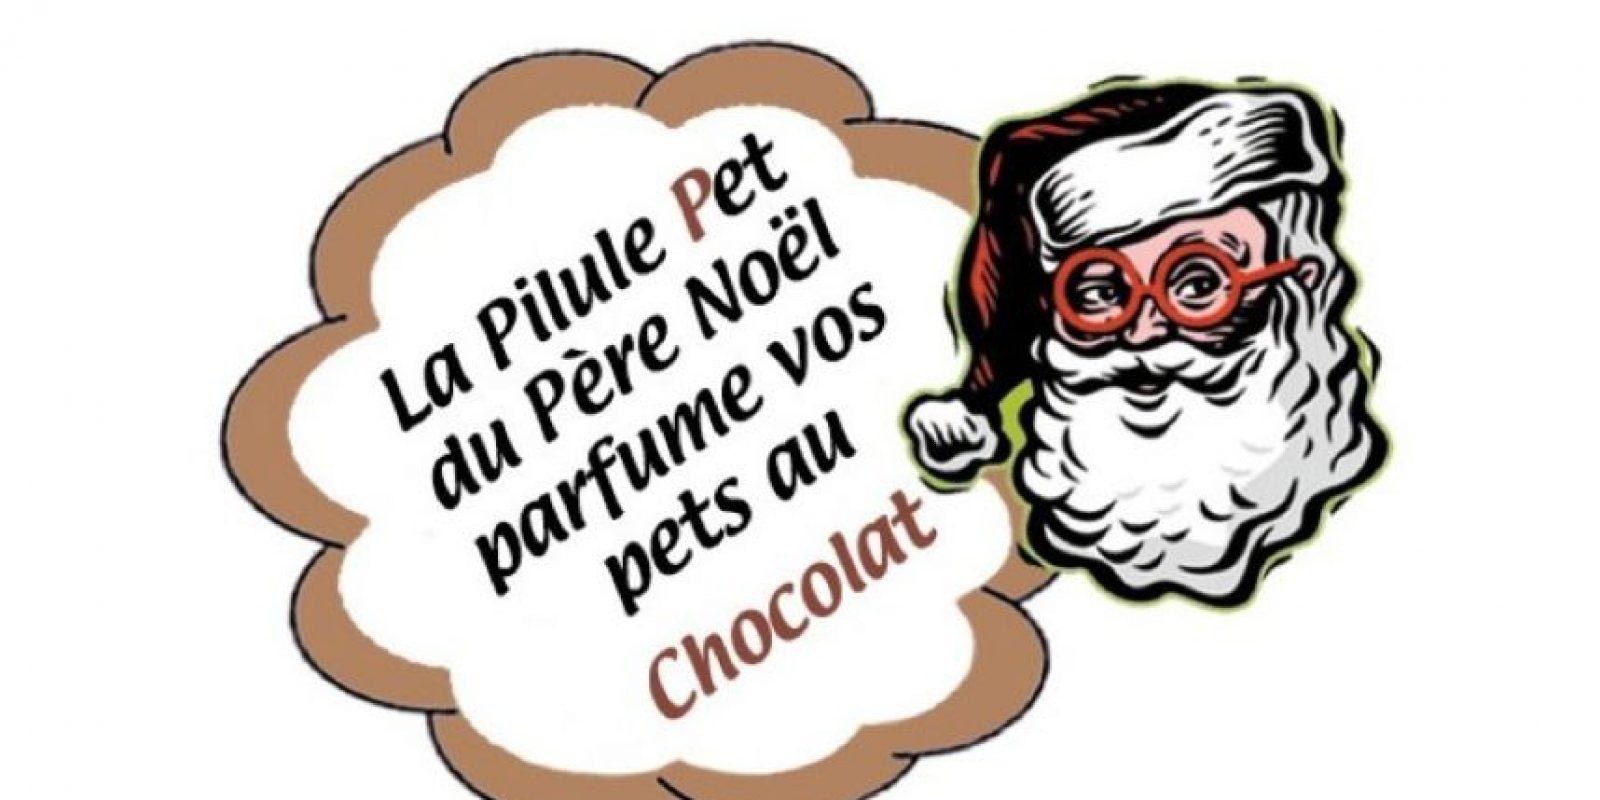 Chocolate fue el aroma predilecto. Foto:pilulepet.com